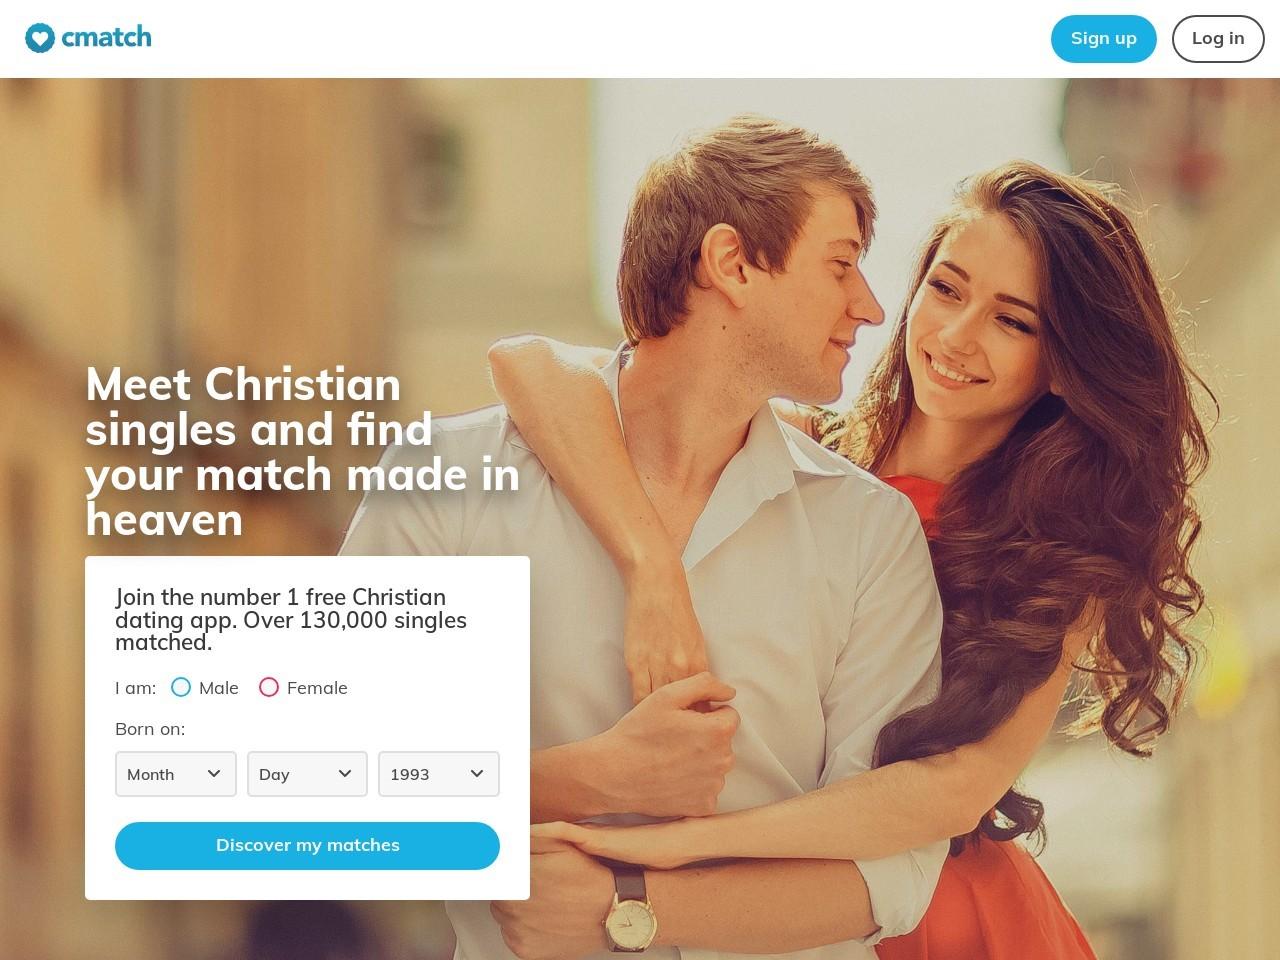 Christian Matches